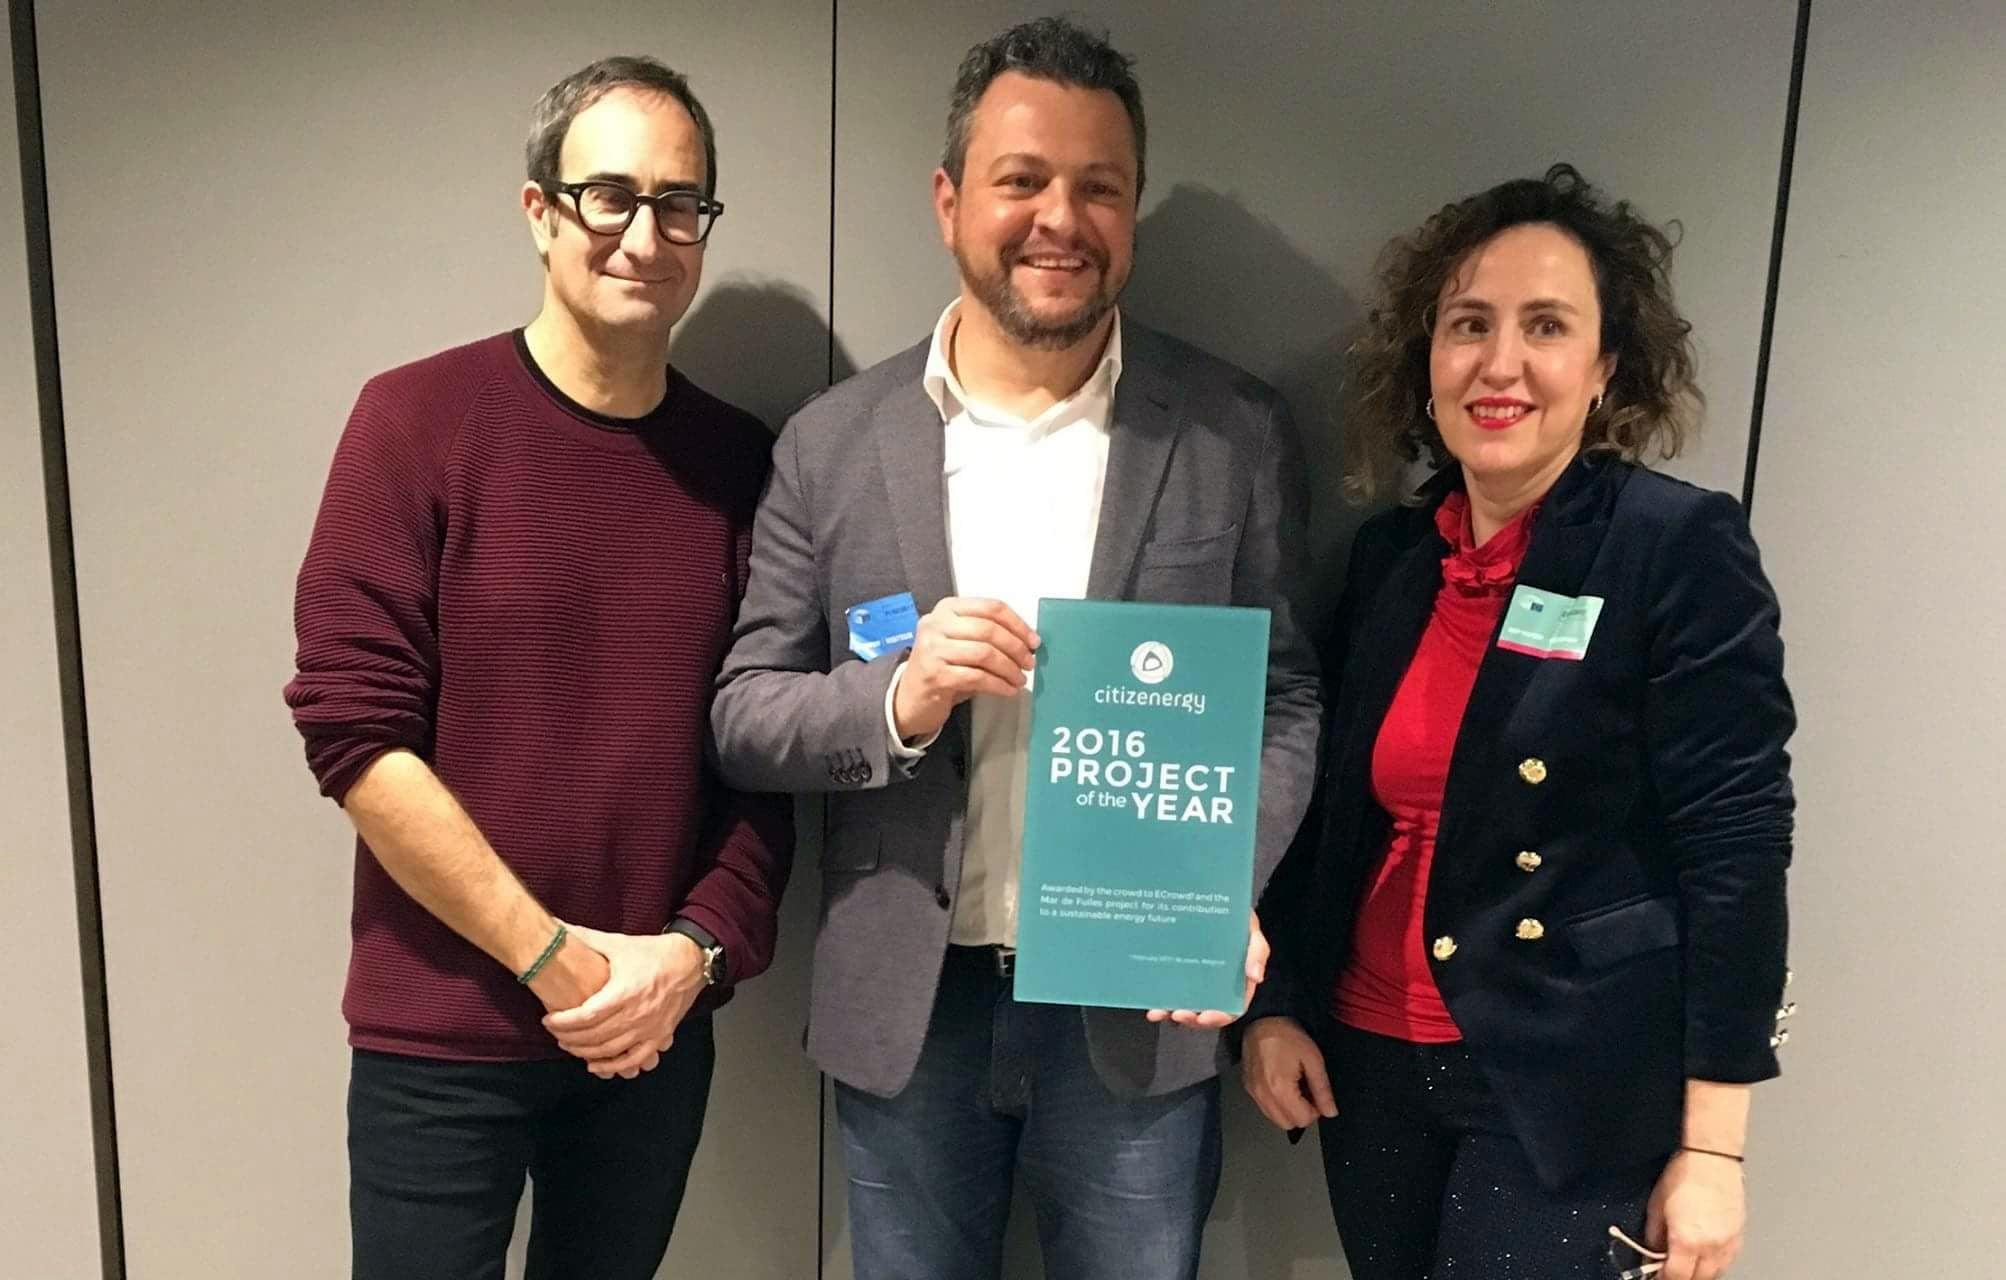 Heliotec celebra el cuarto aniversario del premio Citizenenergy del Parlamento Europeo